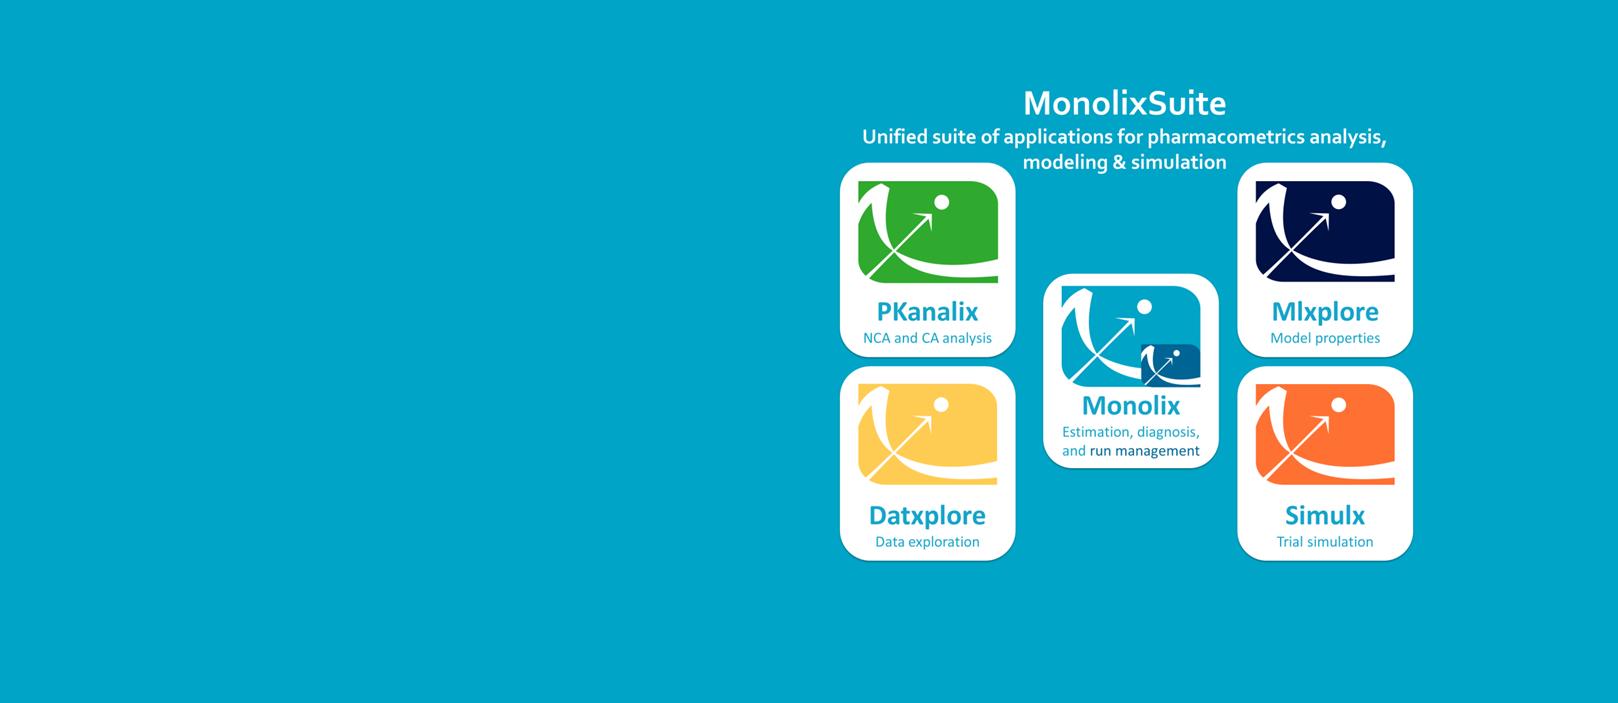 MonolixSuite Workshop (Guangzhou, China,  Fri. November 8th, 2019)